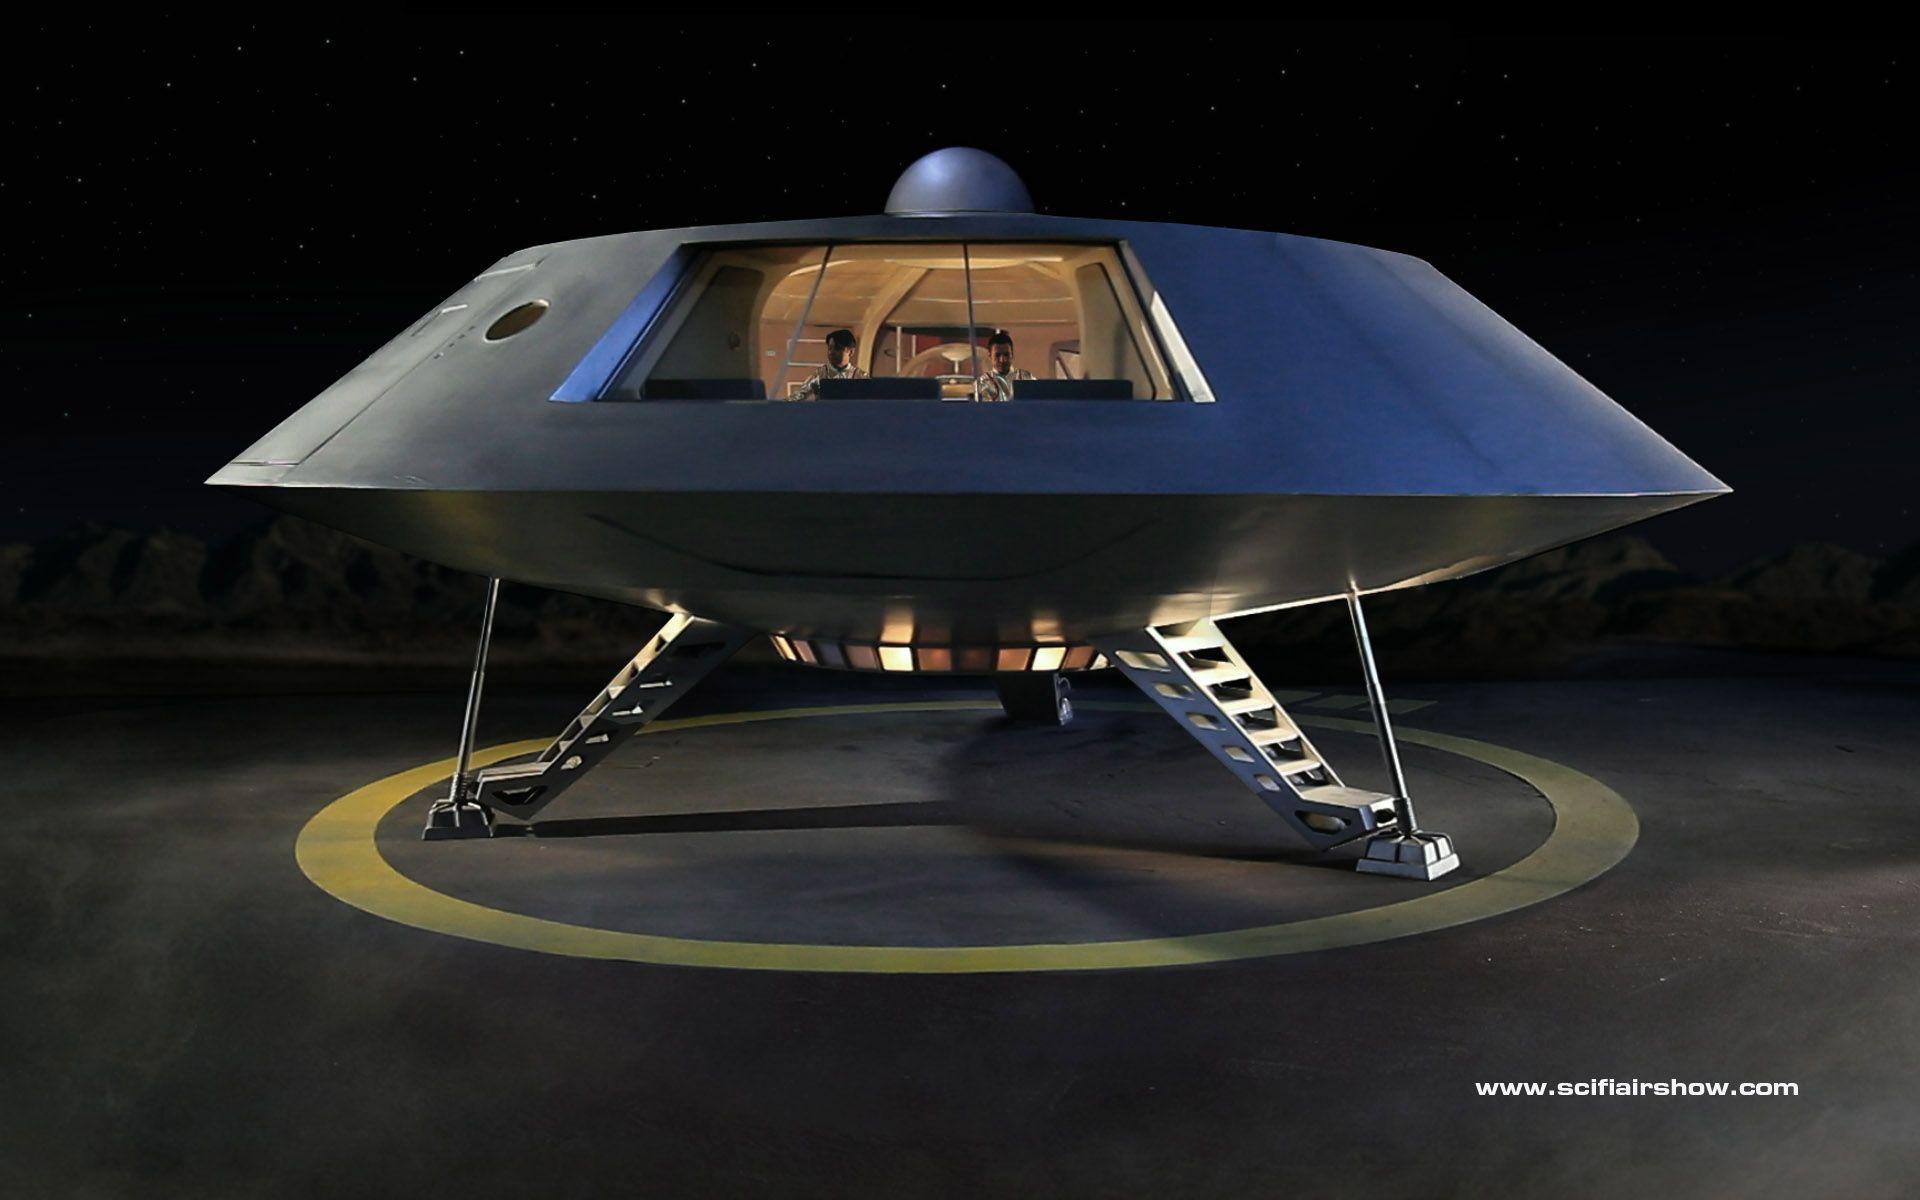 tv spacecraft - photo #28